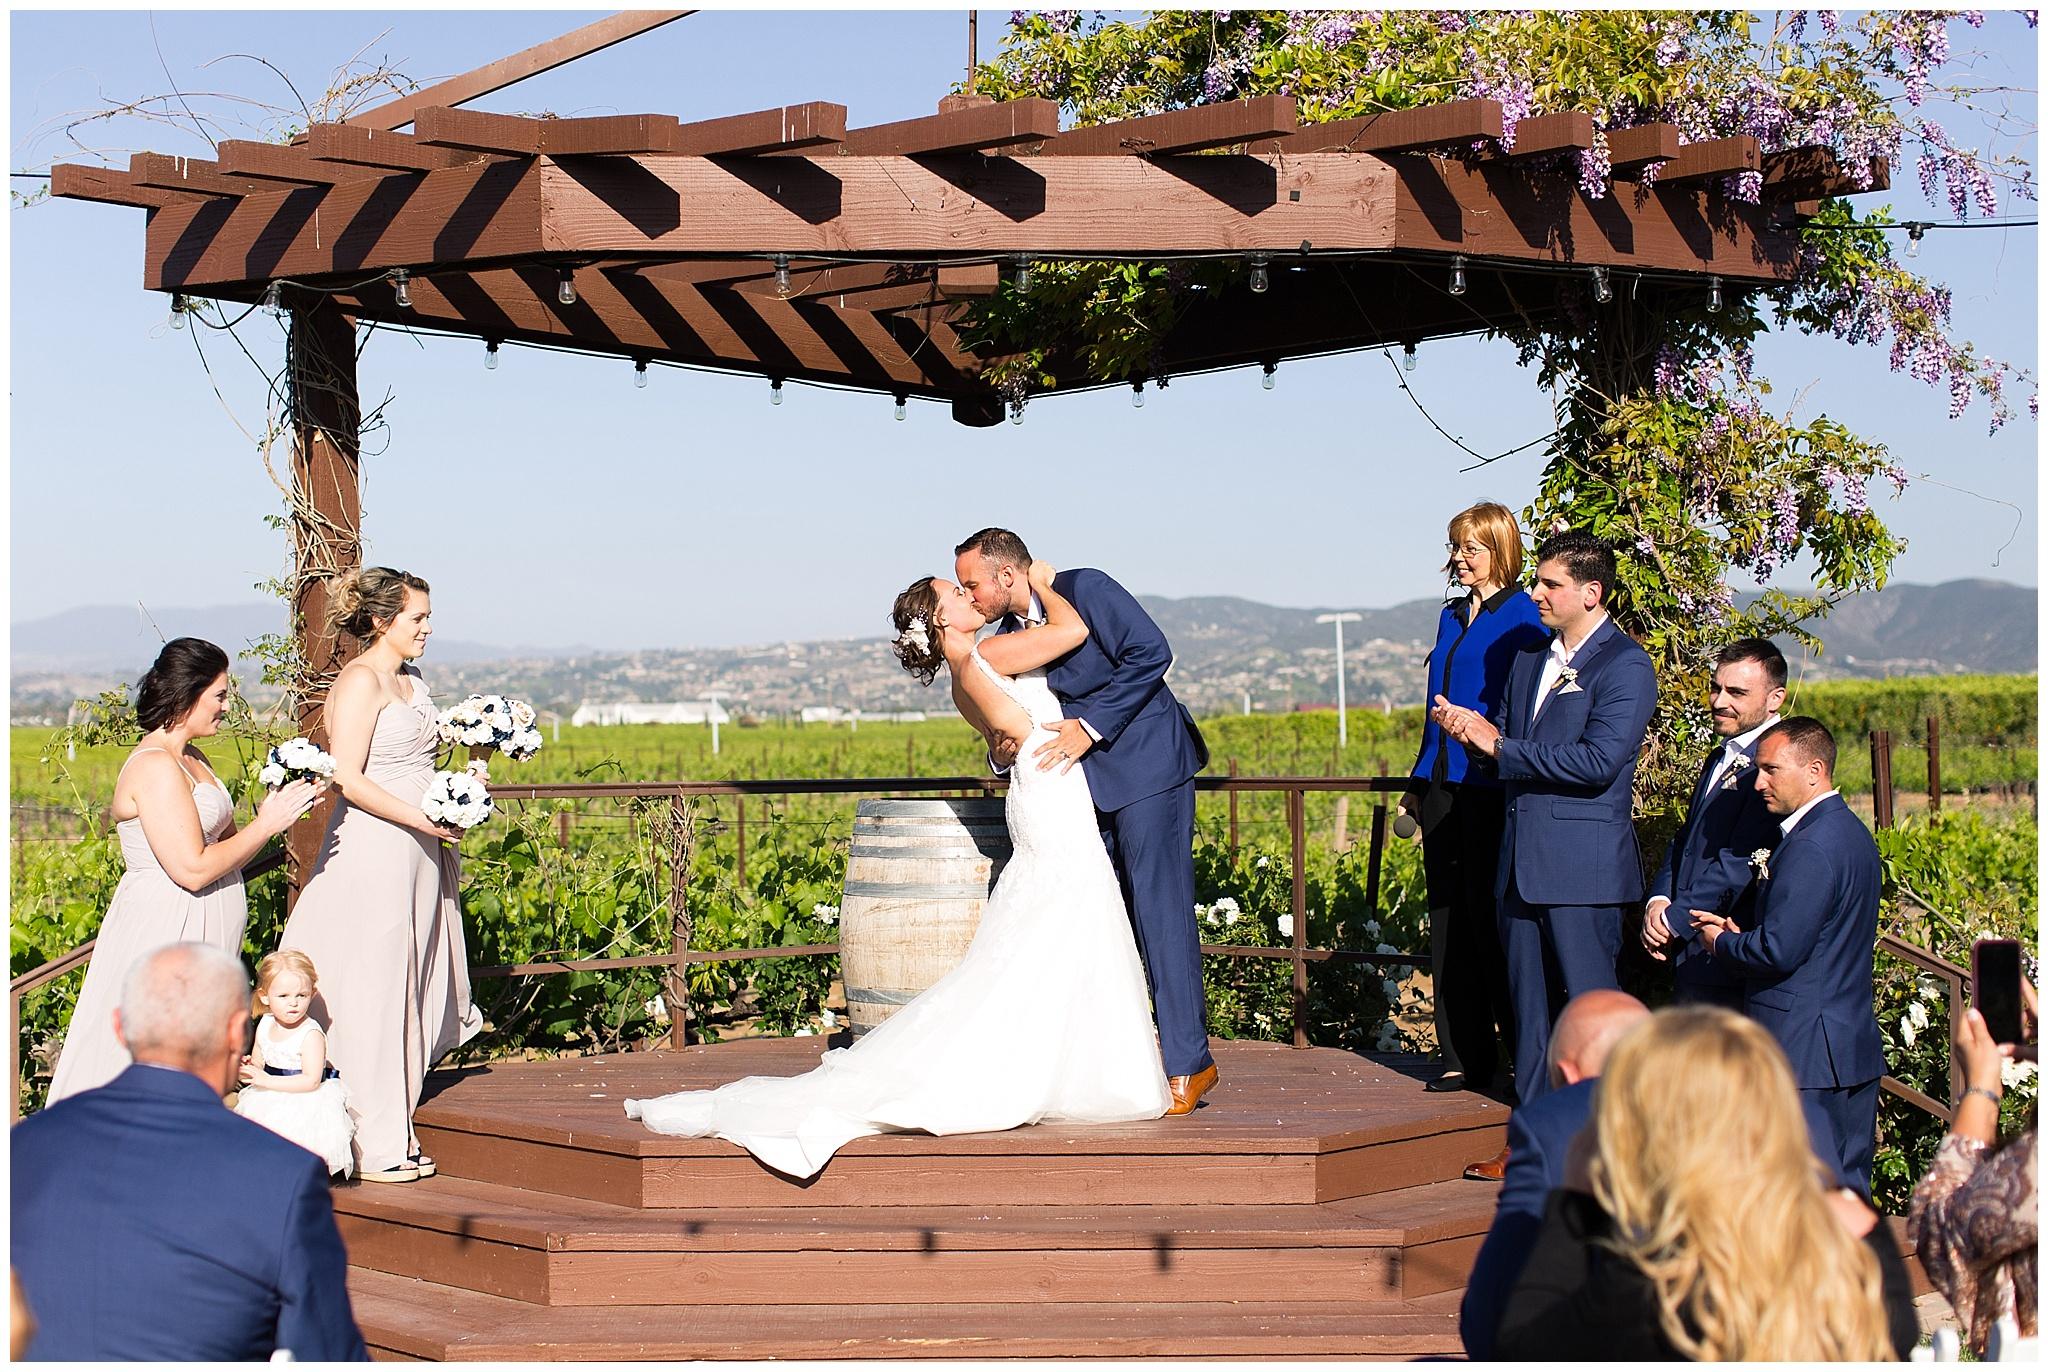 Vinny-Cayt-Wedding-04-26-18-1433-1.jpg